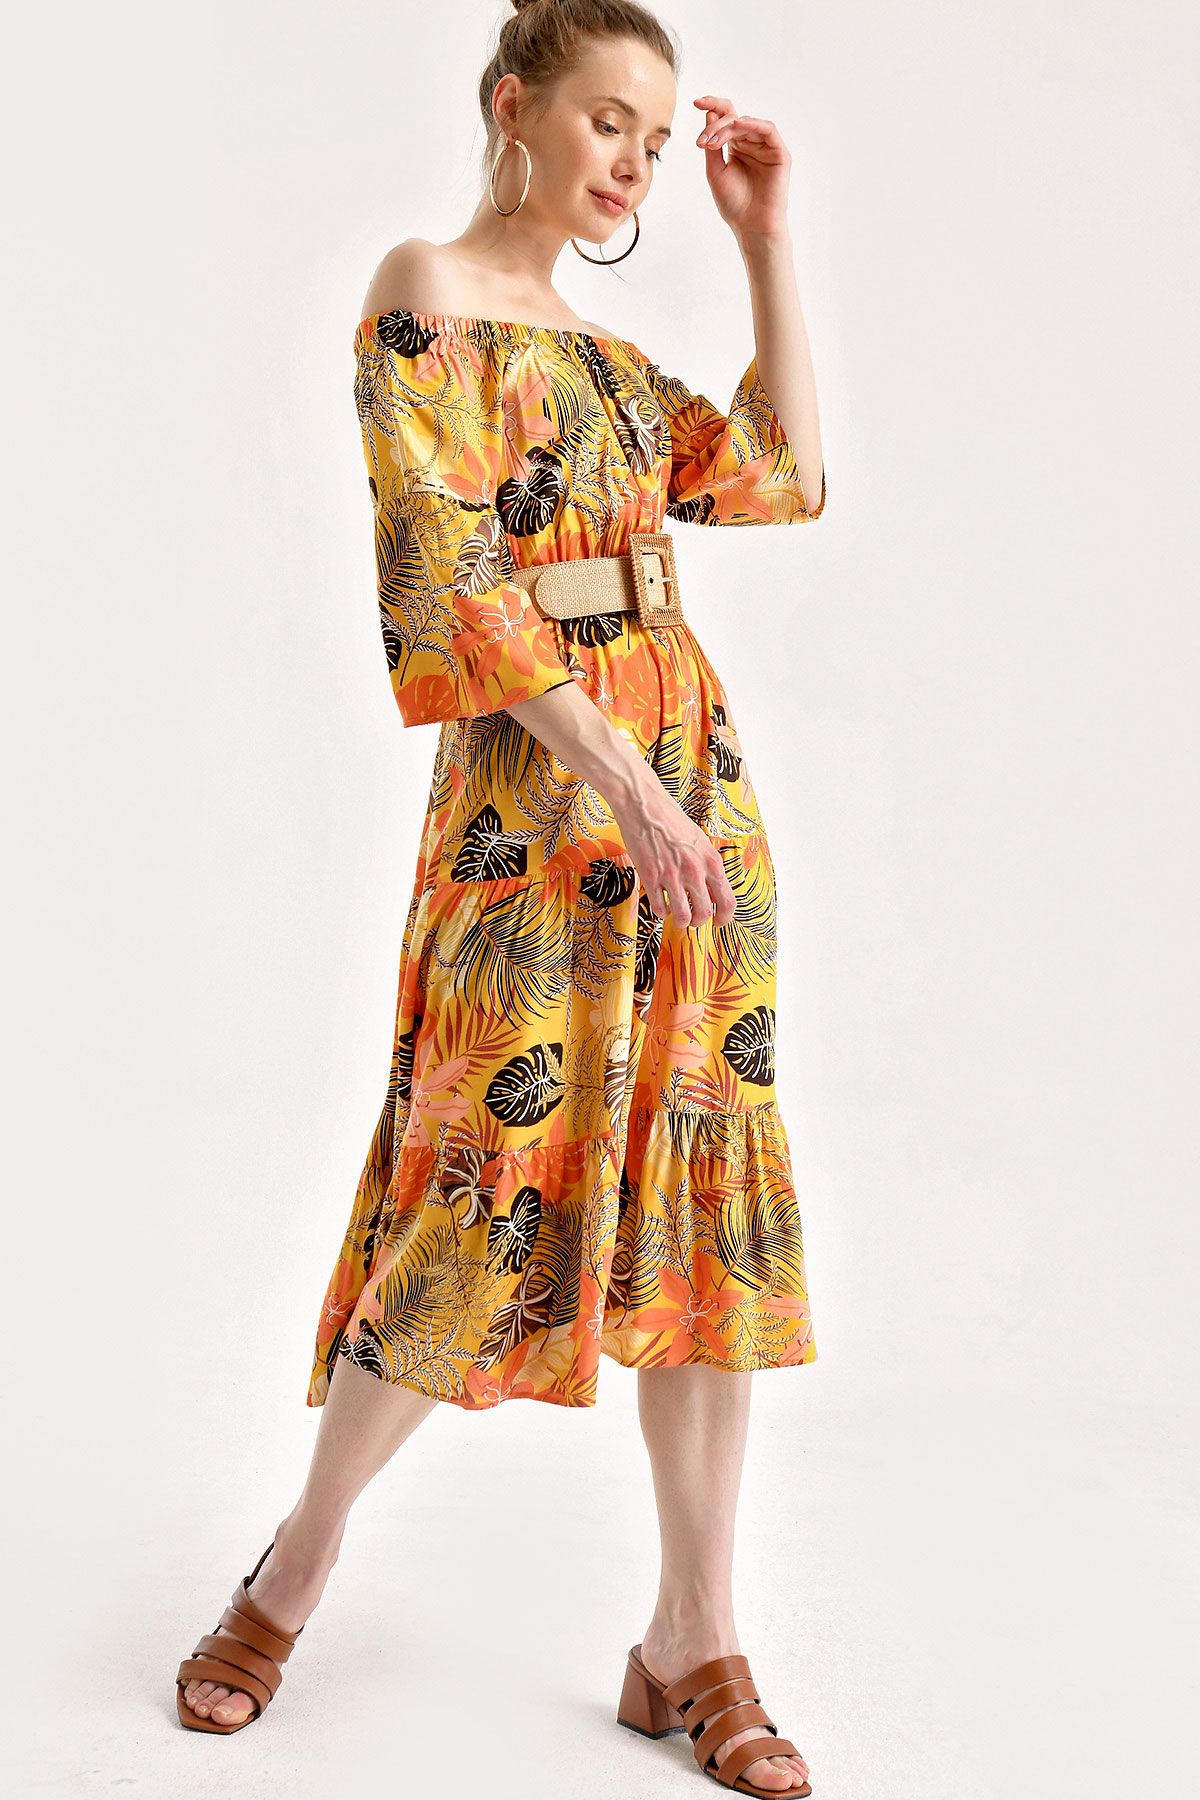 Women's Elastic Neckline Patterned Mustard Midi Dress